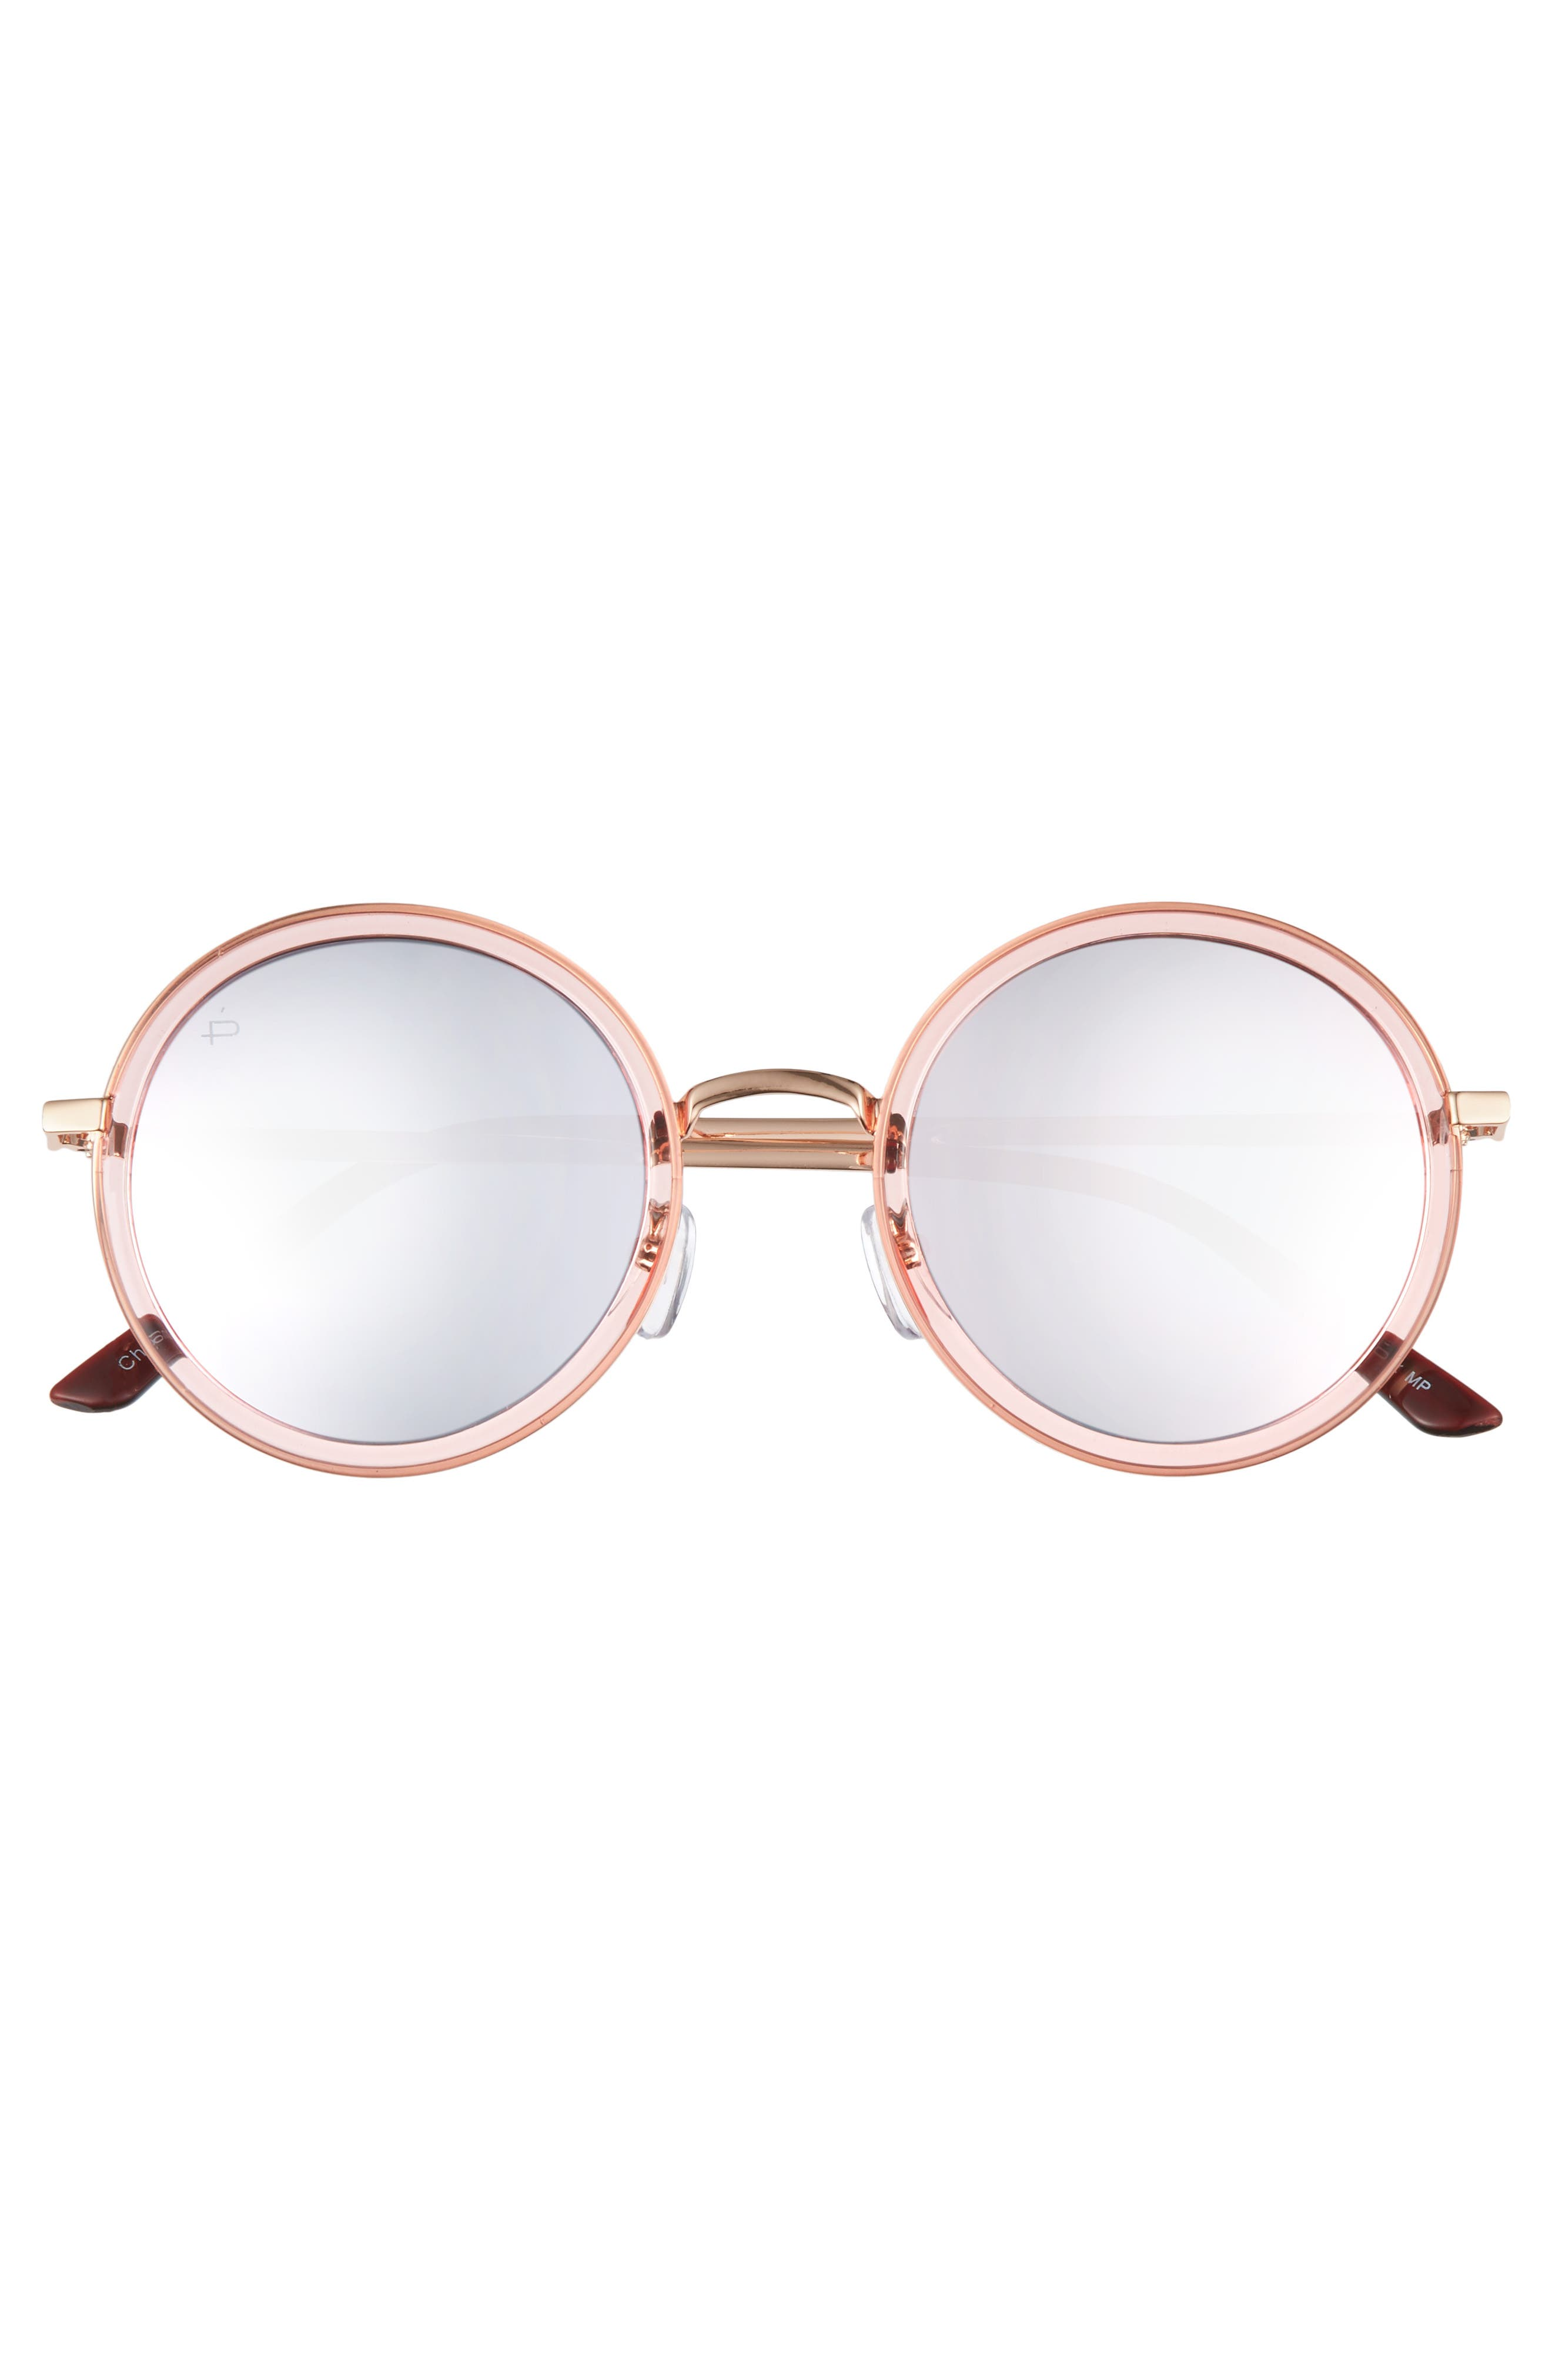 Privé Revaux x Madelaine Petsch The Street 53mm Round Sunglasses,                             Alternate thumbnail 8, color,